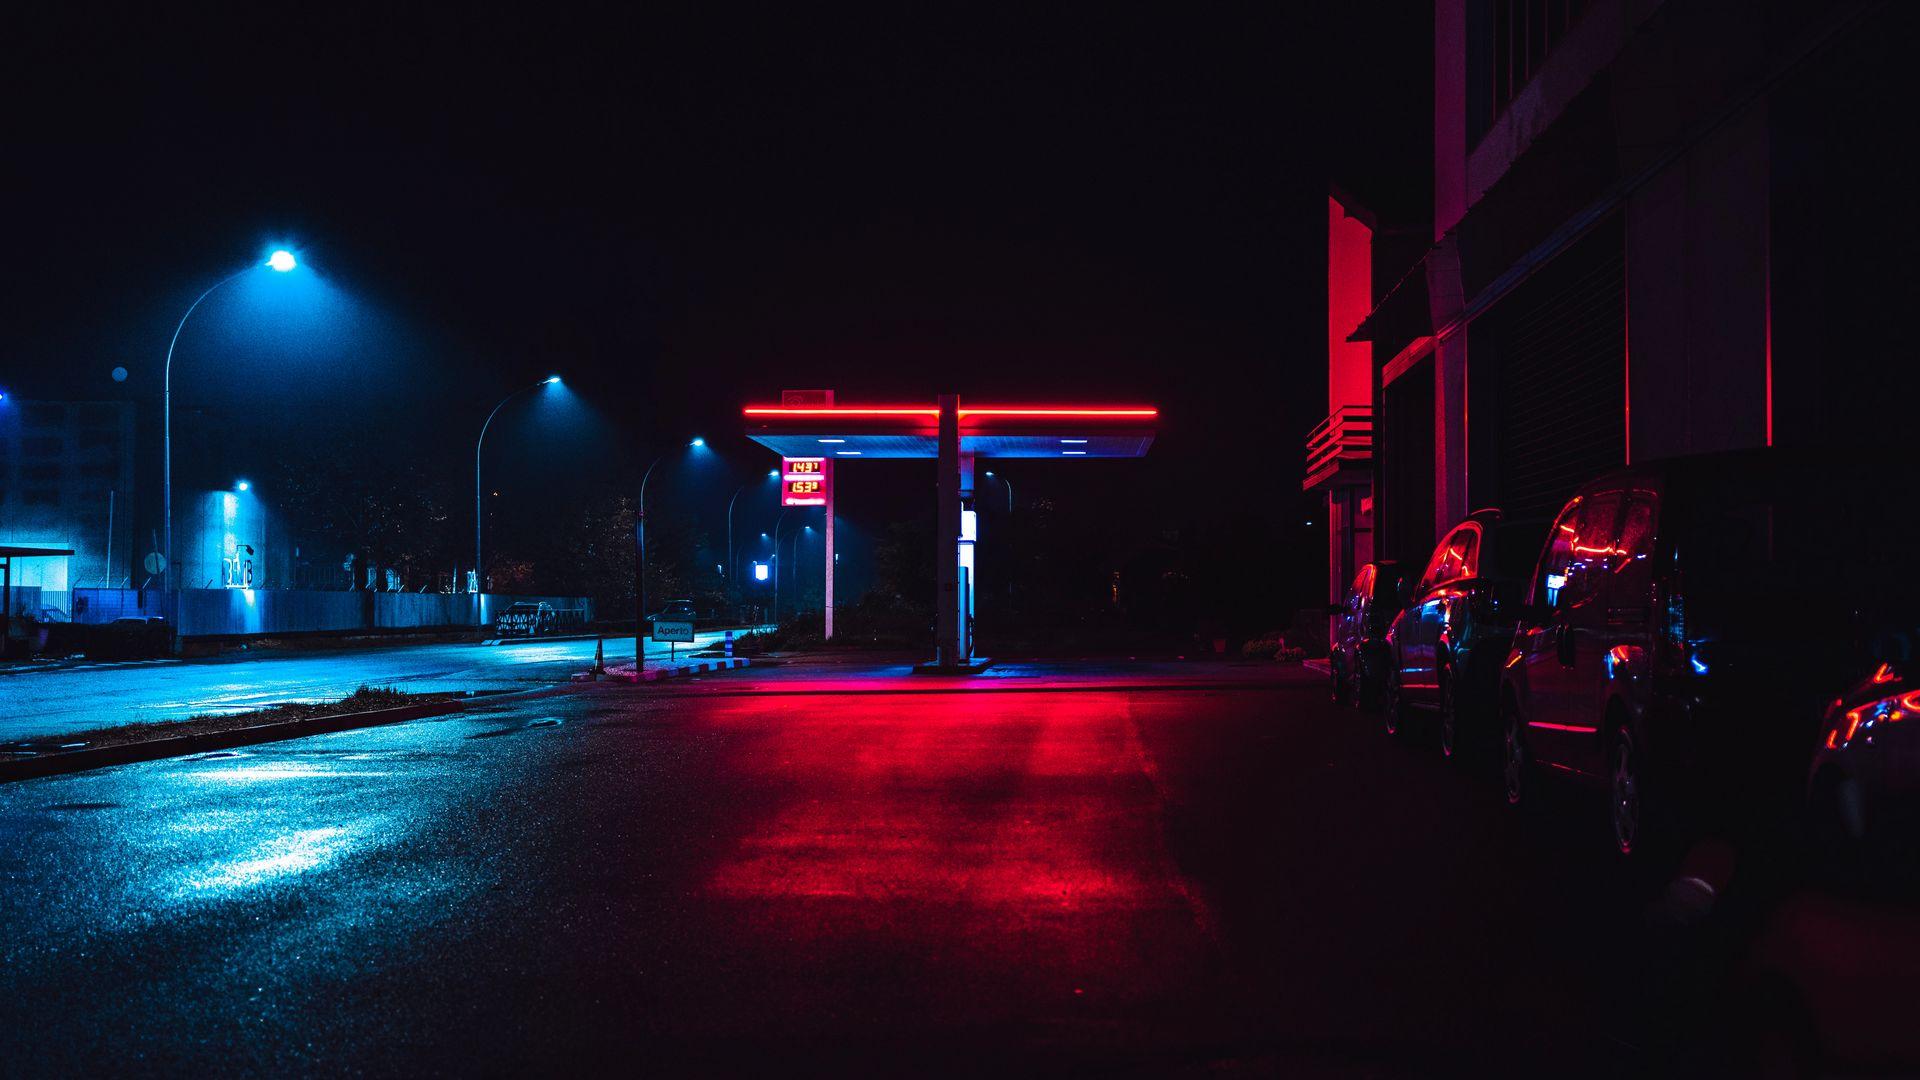 11+ Top Wallpaper Full Hd Neon